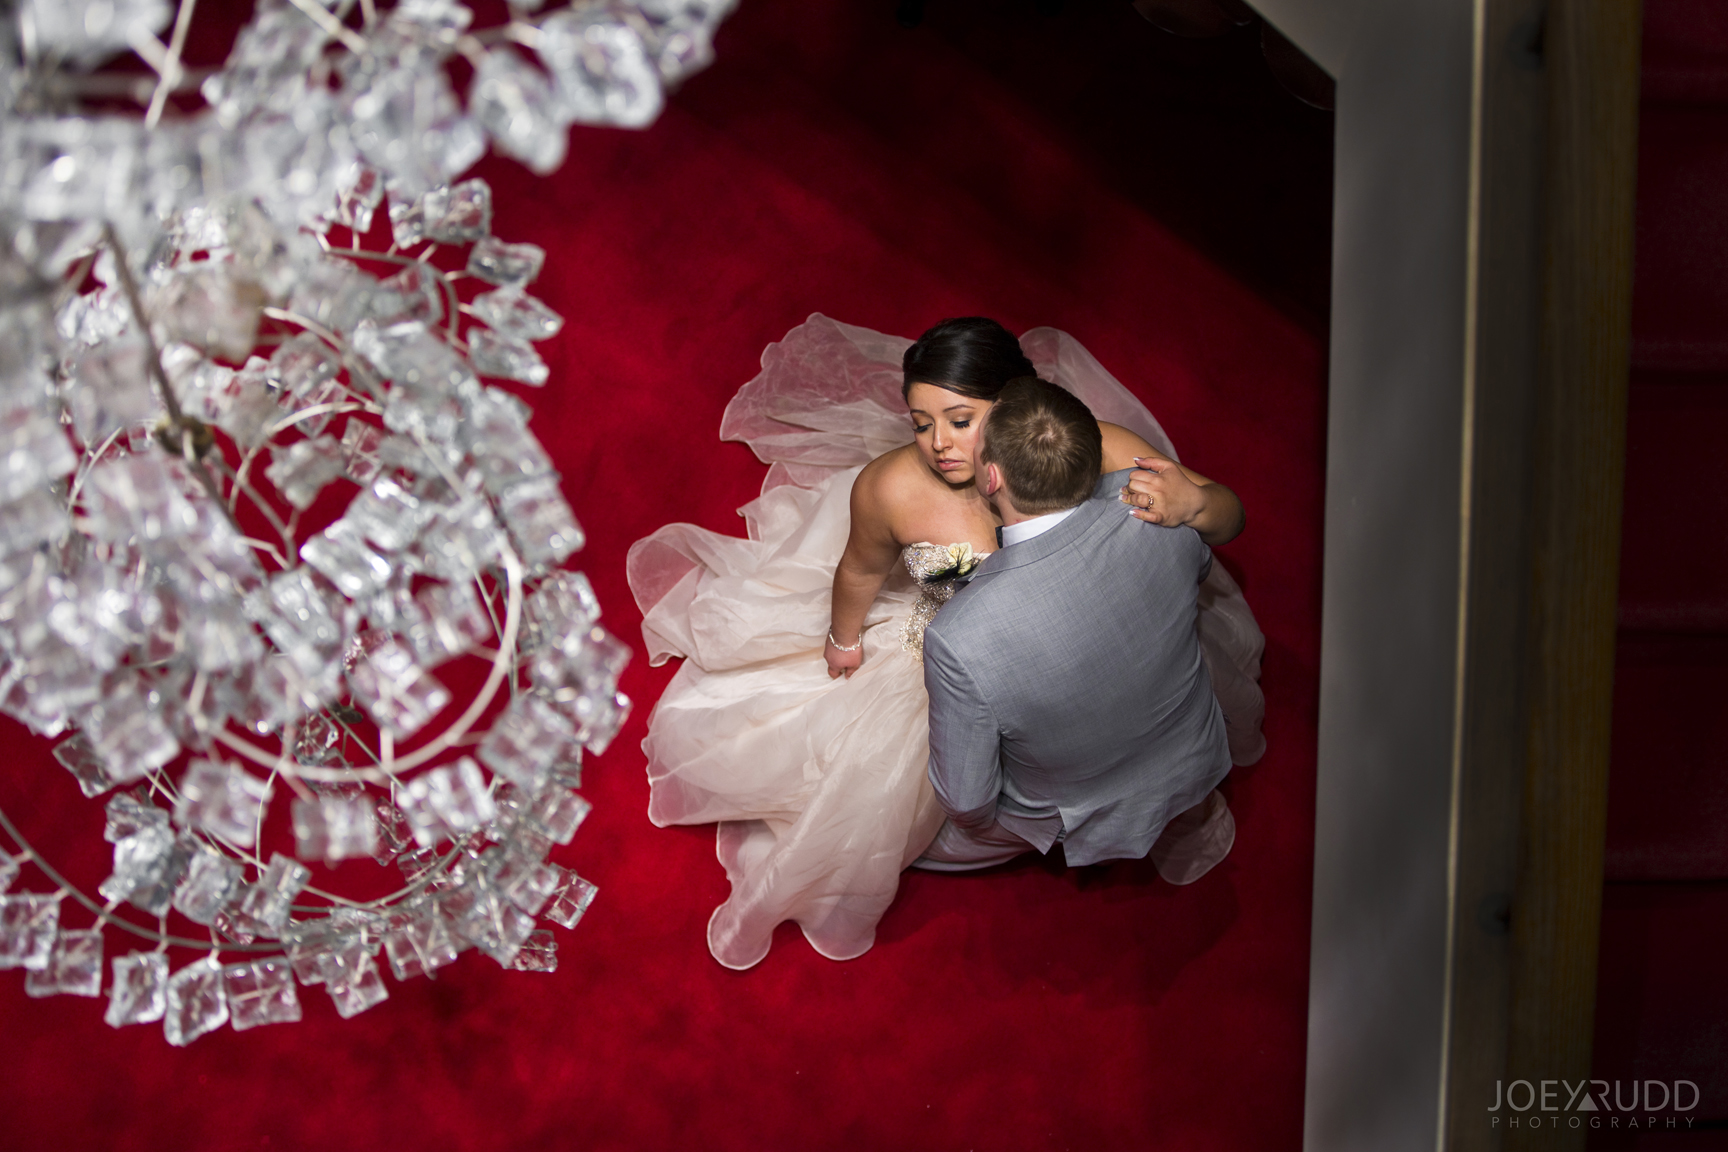 Best Wedding Photographer in Ottawa Joey Rudd Photography National Arts Centre Pricing